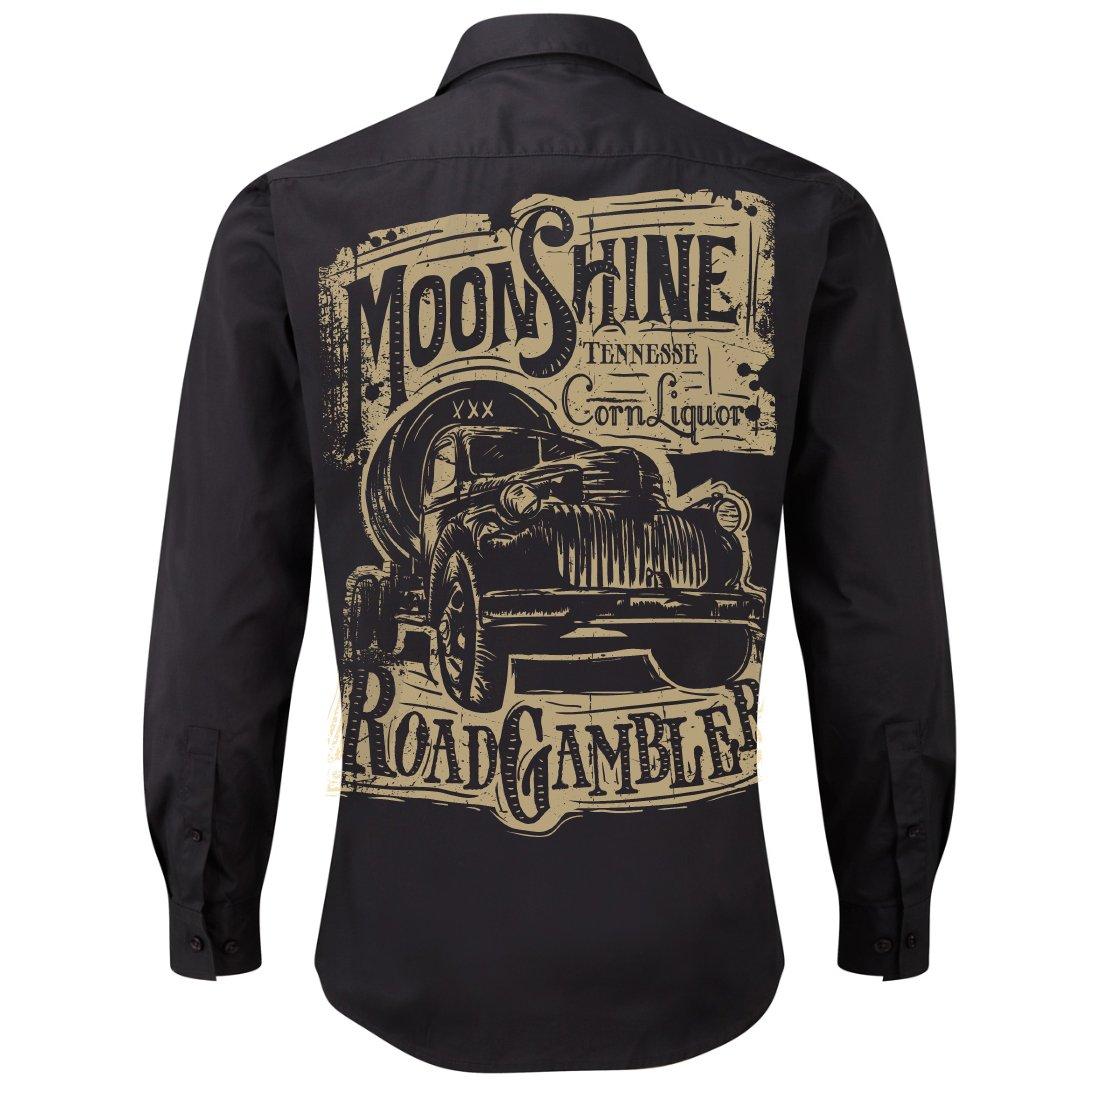 ROAD RODEO Rockabilly,Mechanic Work Shirt, Longsleeve, Rock'n'Roll, Pick Up, Booze, Moonshine